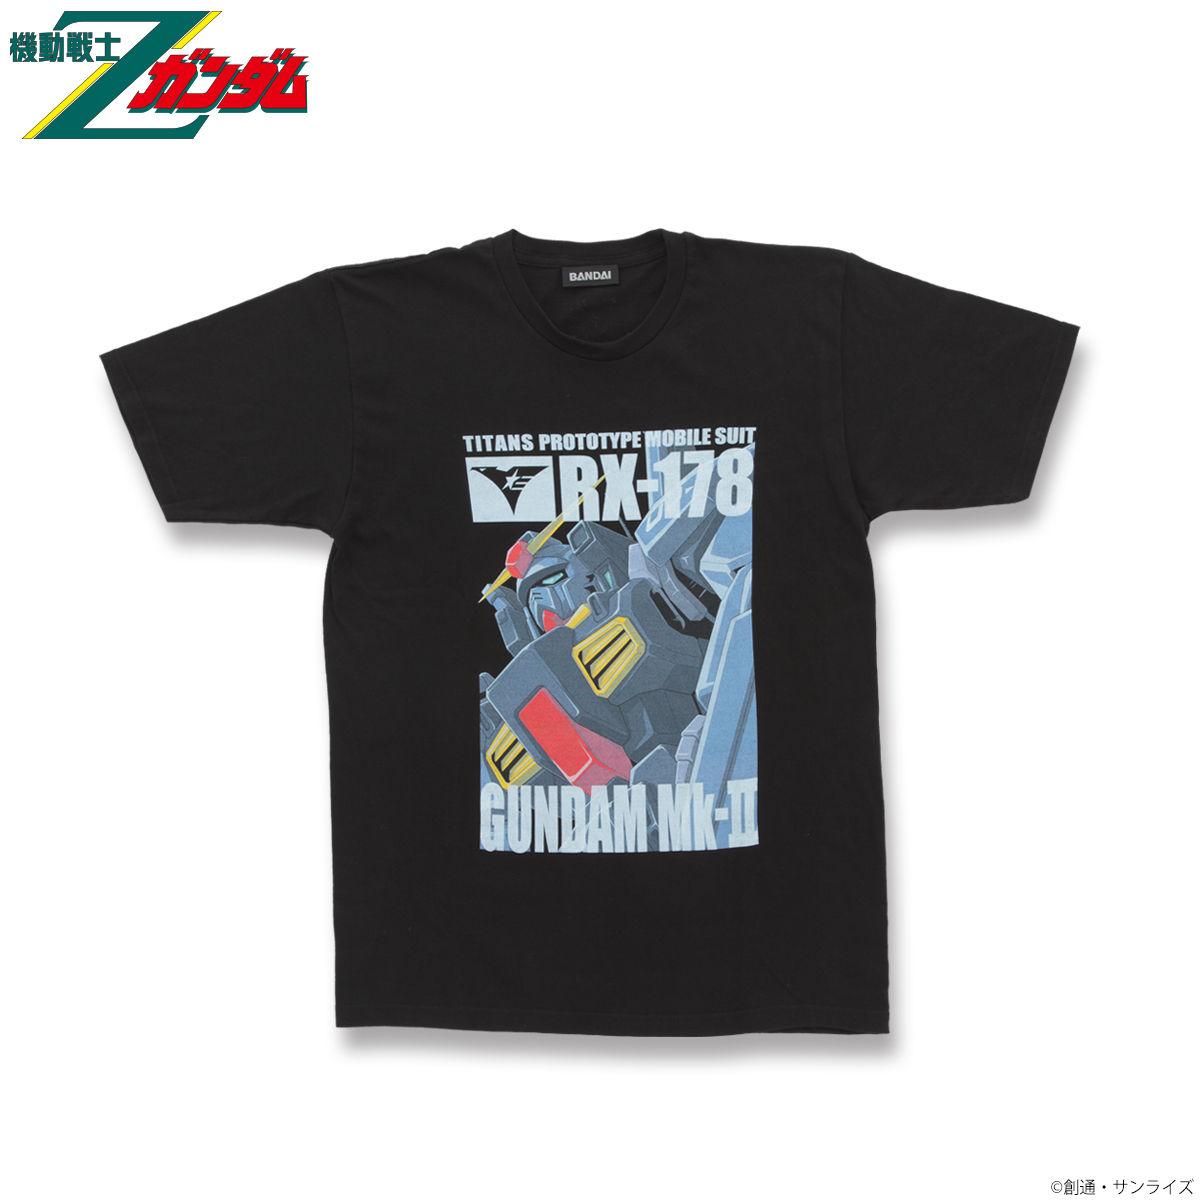 Mobile Suit Zeta Gundam Full Color T-shirt